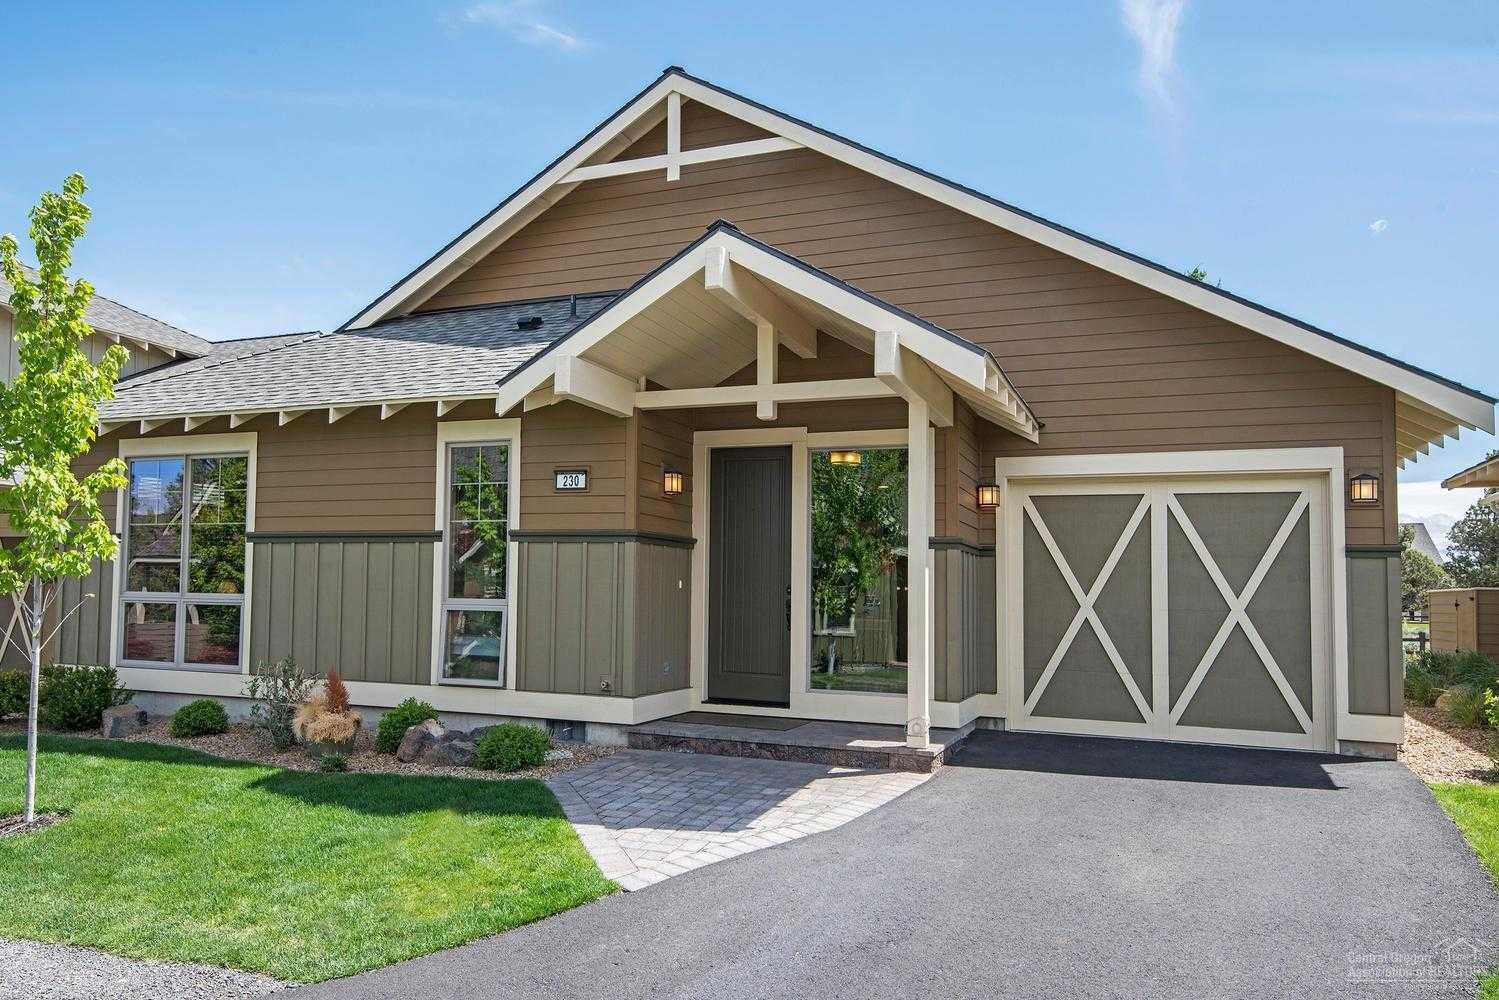 $412,000 - 2Br/2Ba -  for Sale in Desert Sky, Redmond